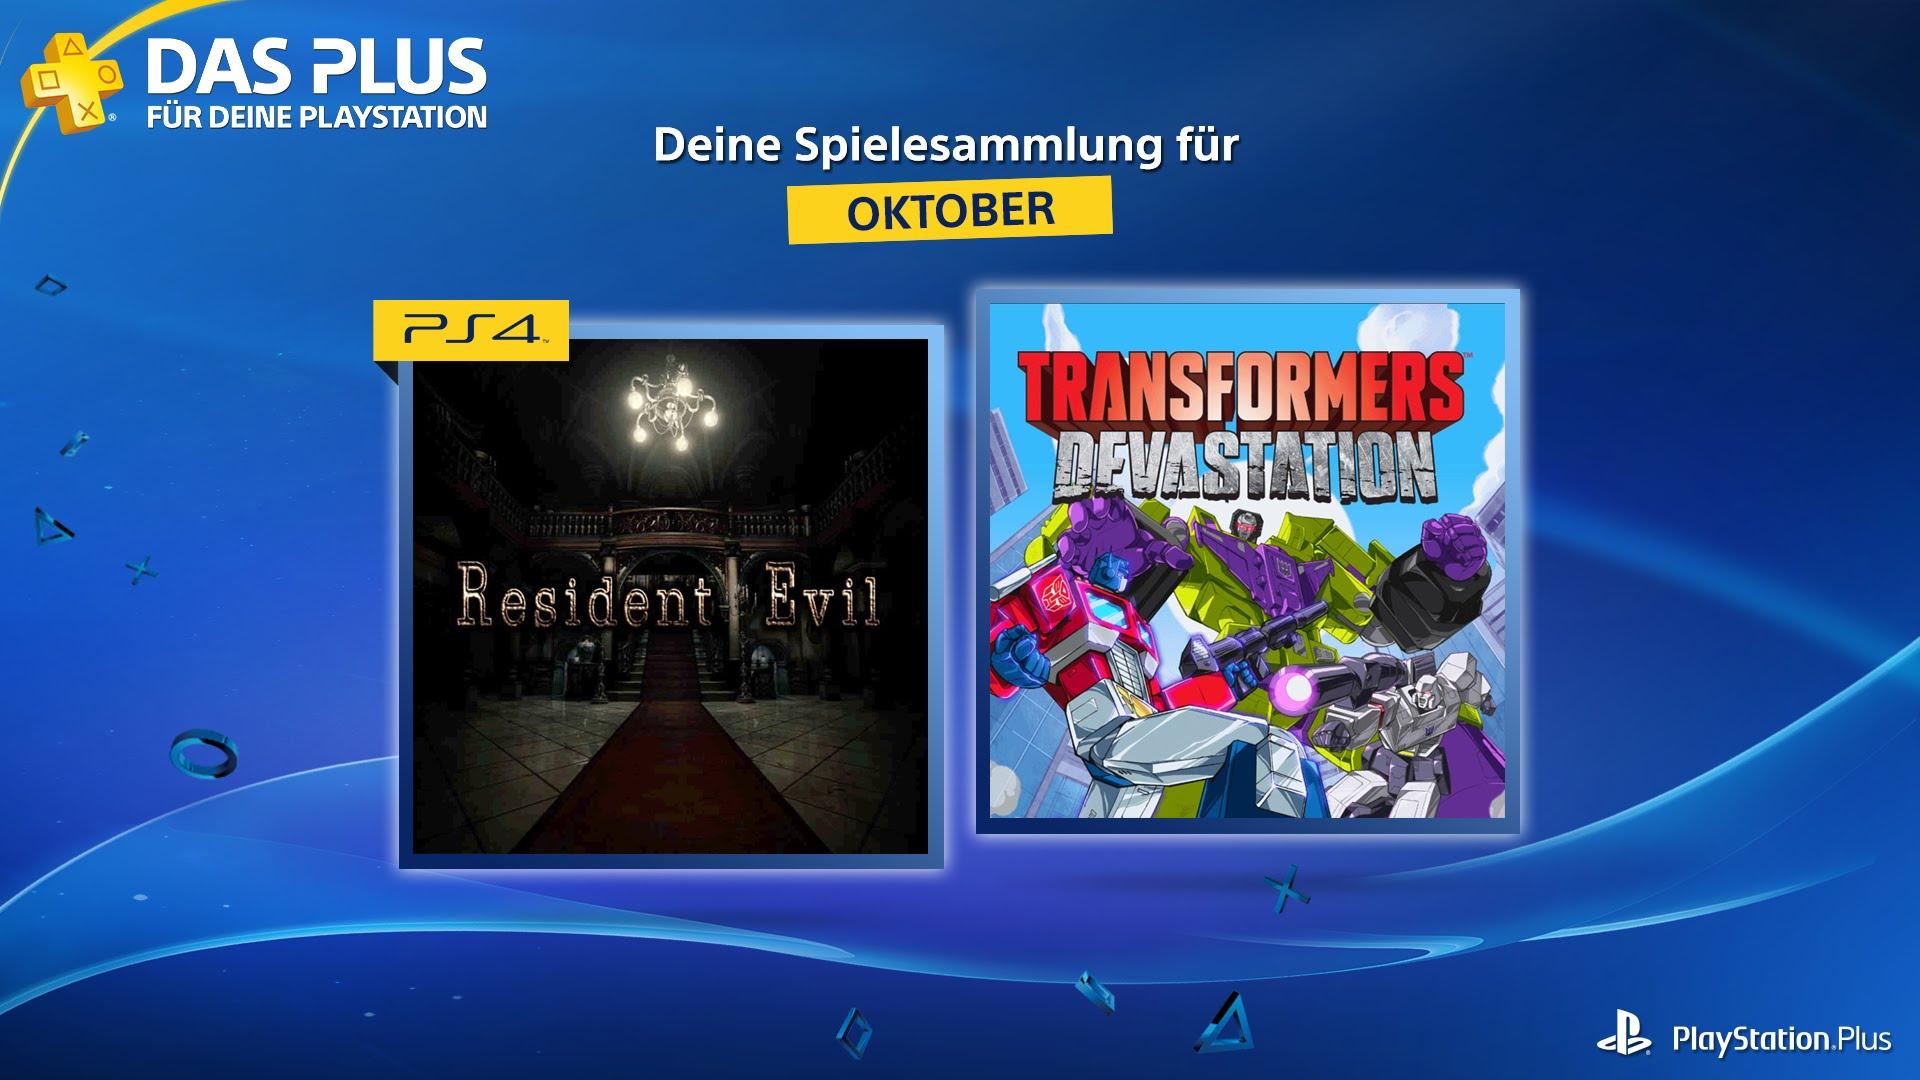 [INFO] Neue PS+ Titel ab 4. Oktober - u.a Resident Evil, Transformers: Devastation